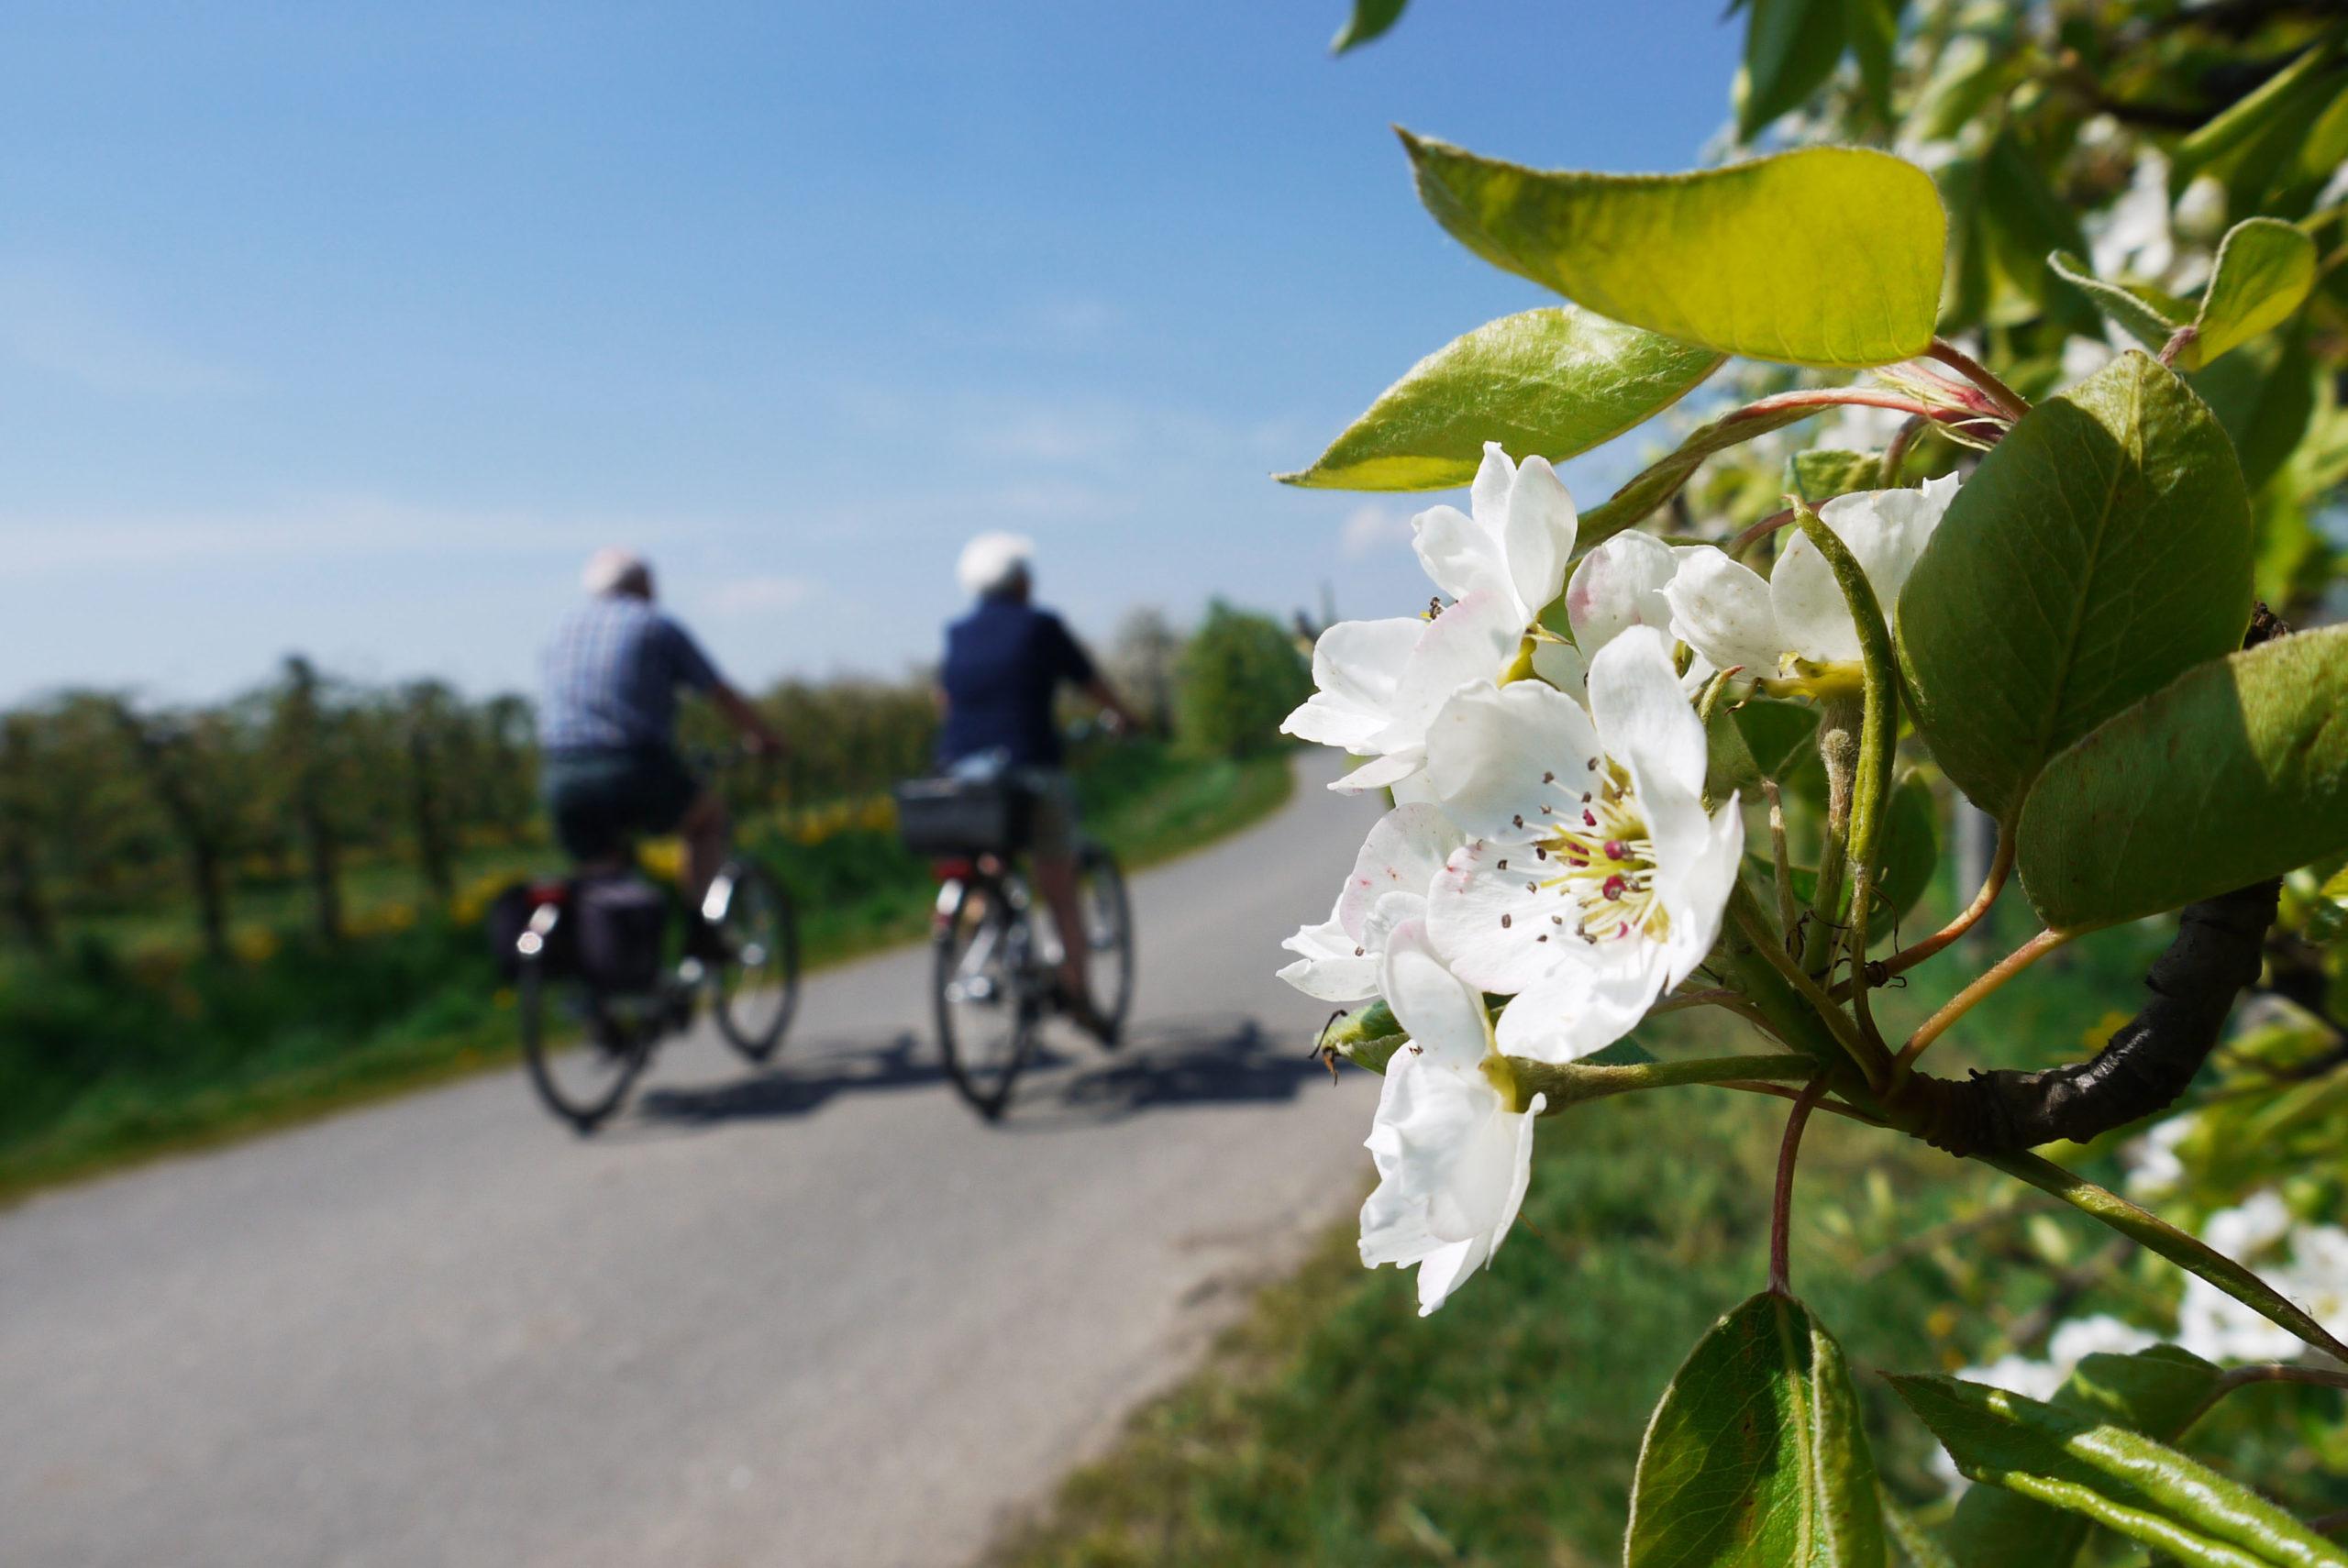 Fahrradtour durchs frühlingshafte Farbenmeer